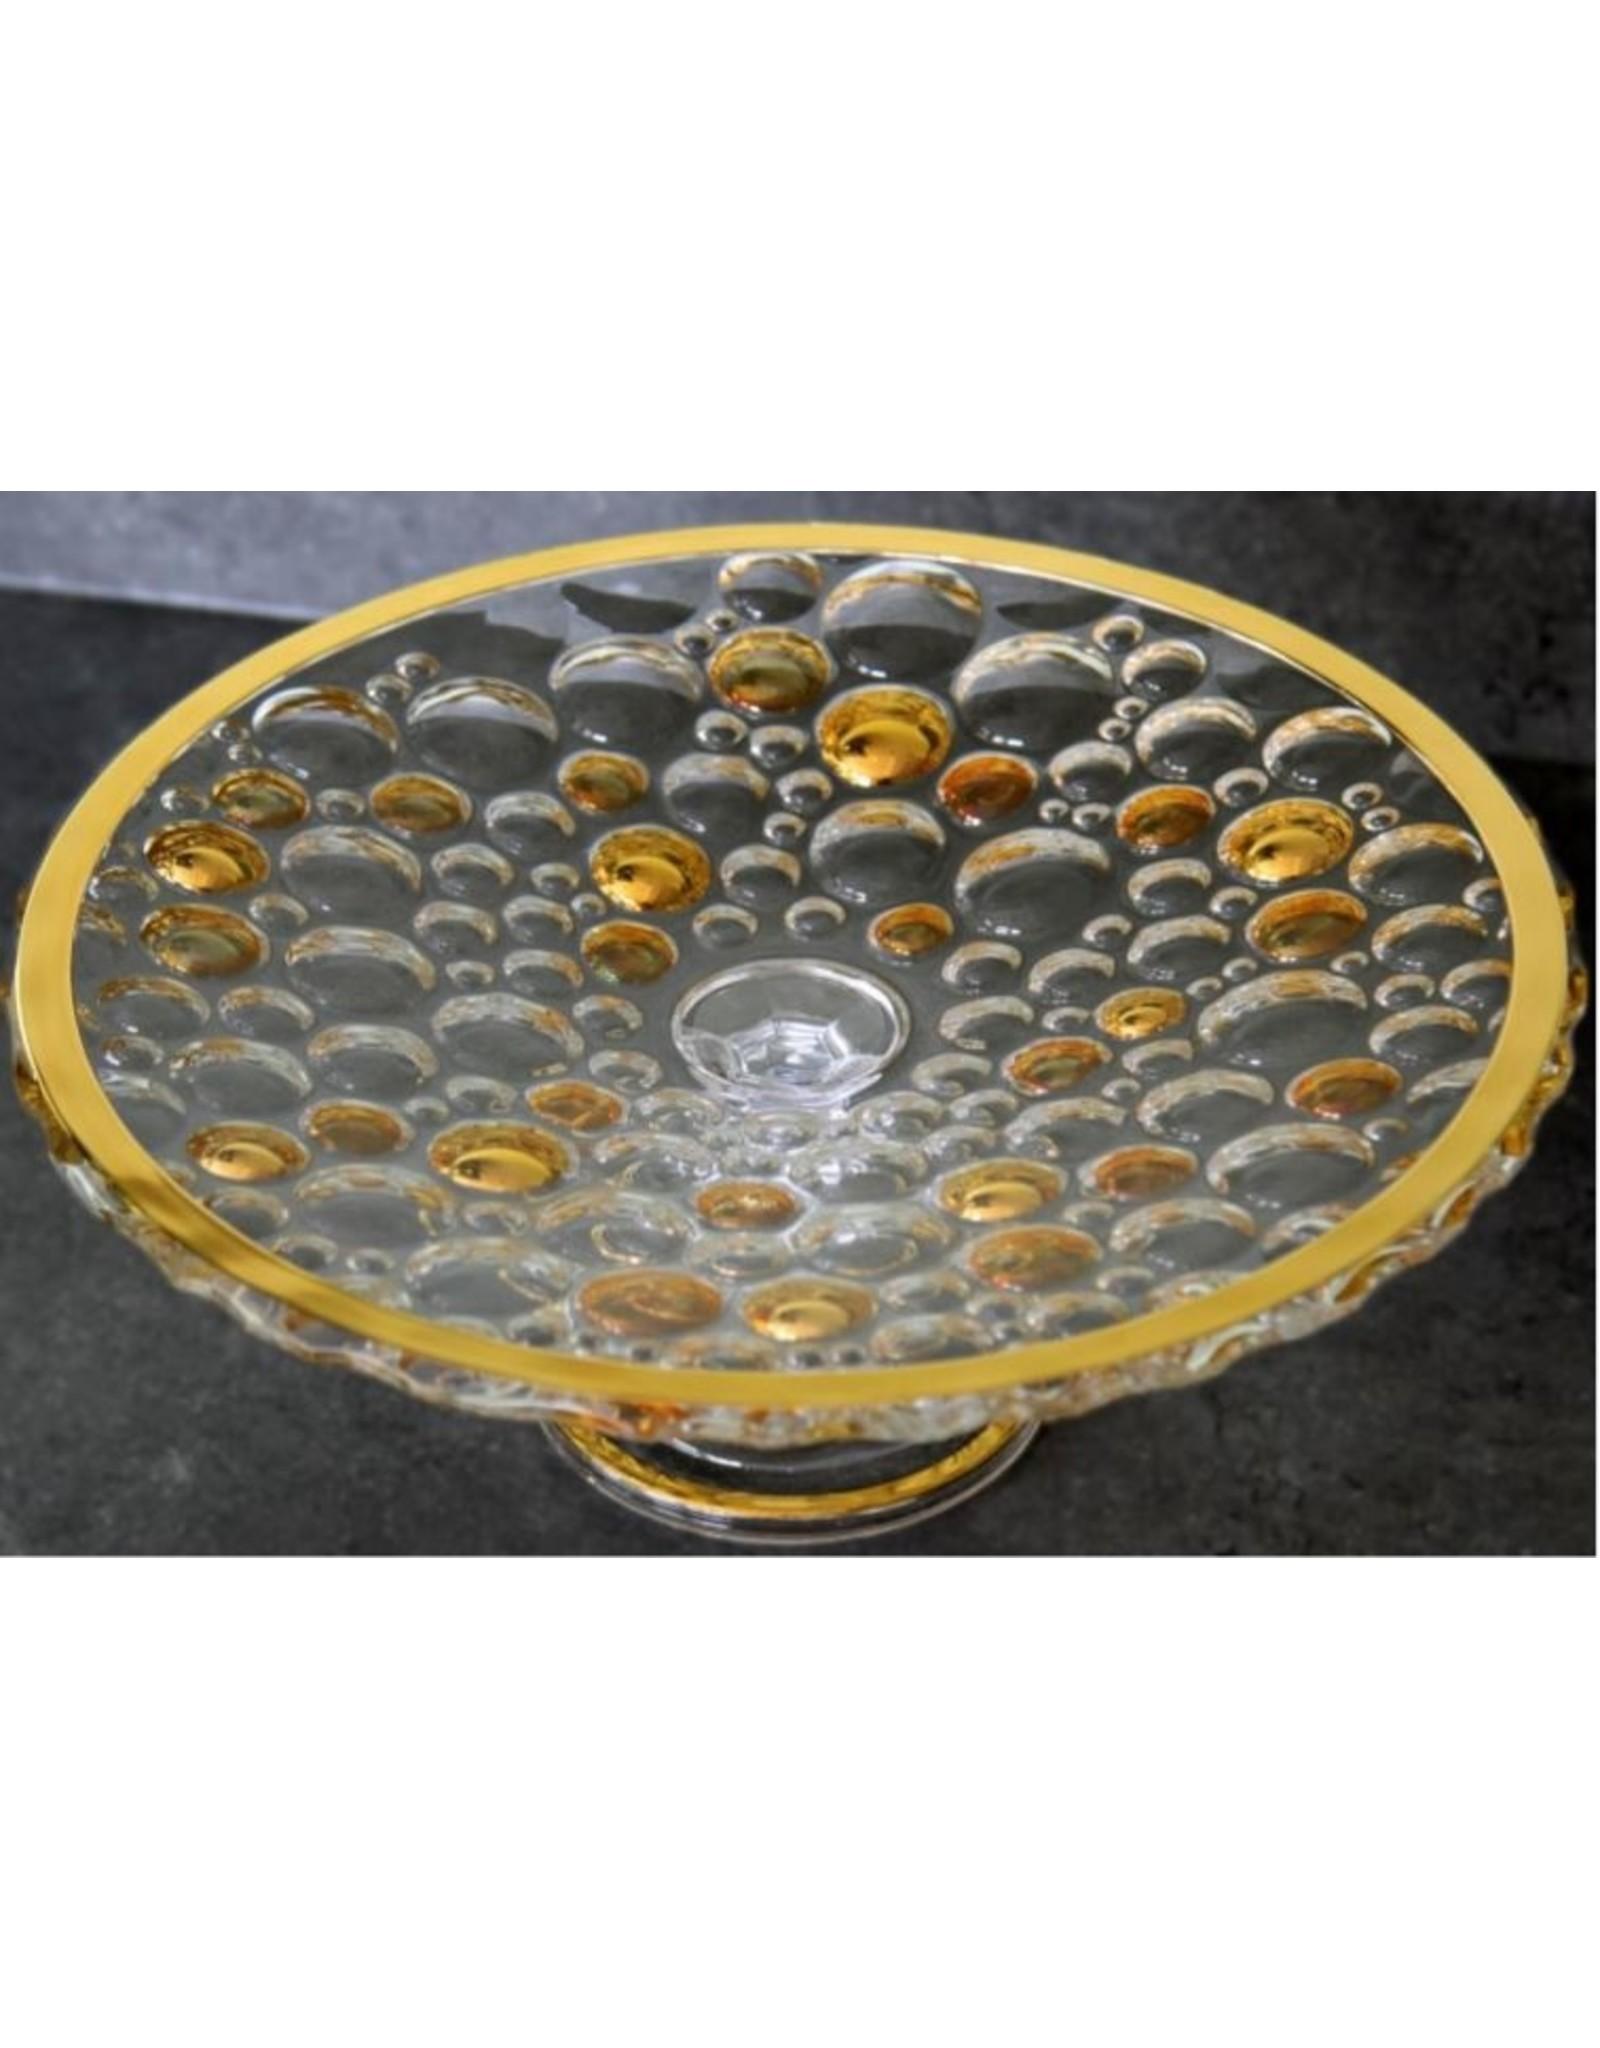 Skloglass Bolla kristal plateau op standaard / goud decoratie